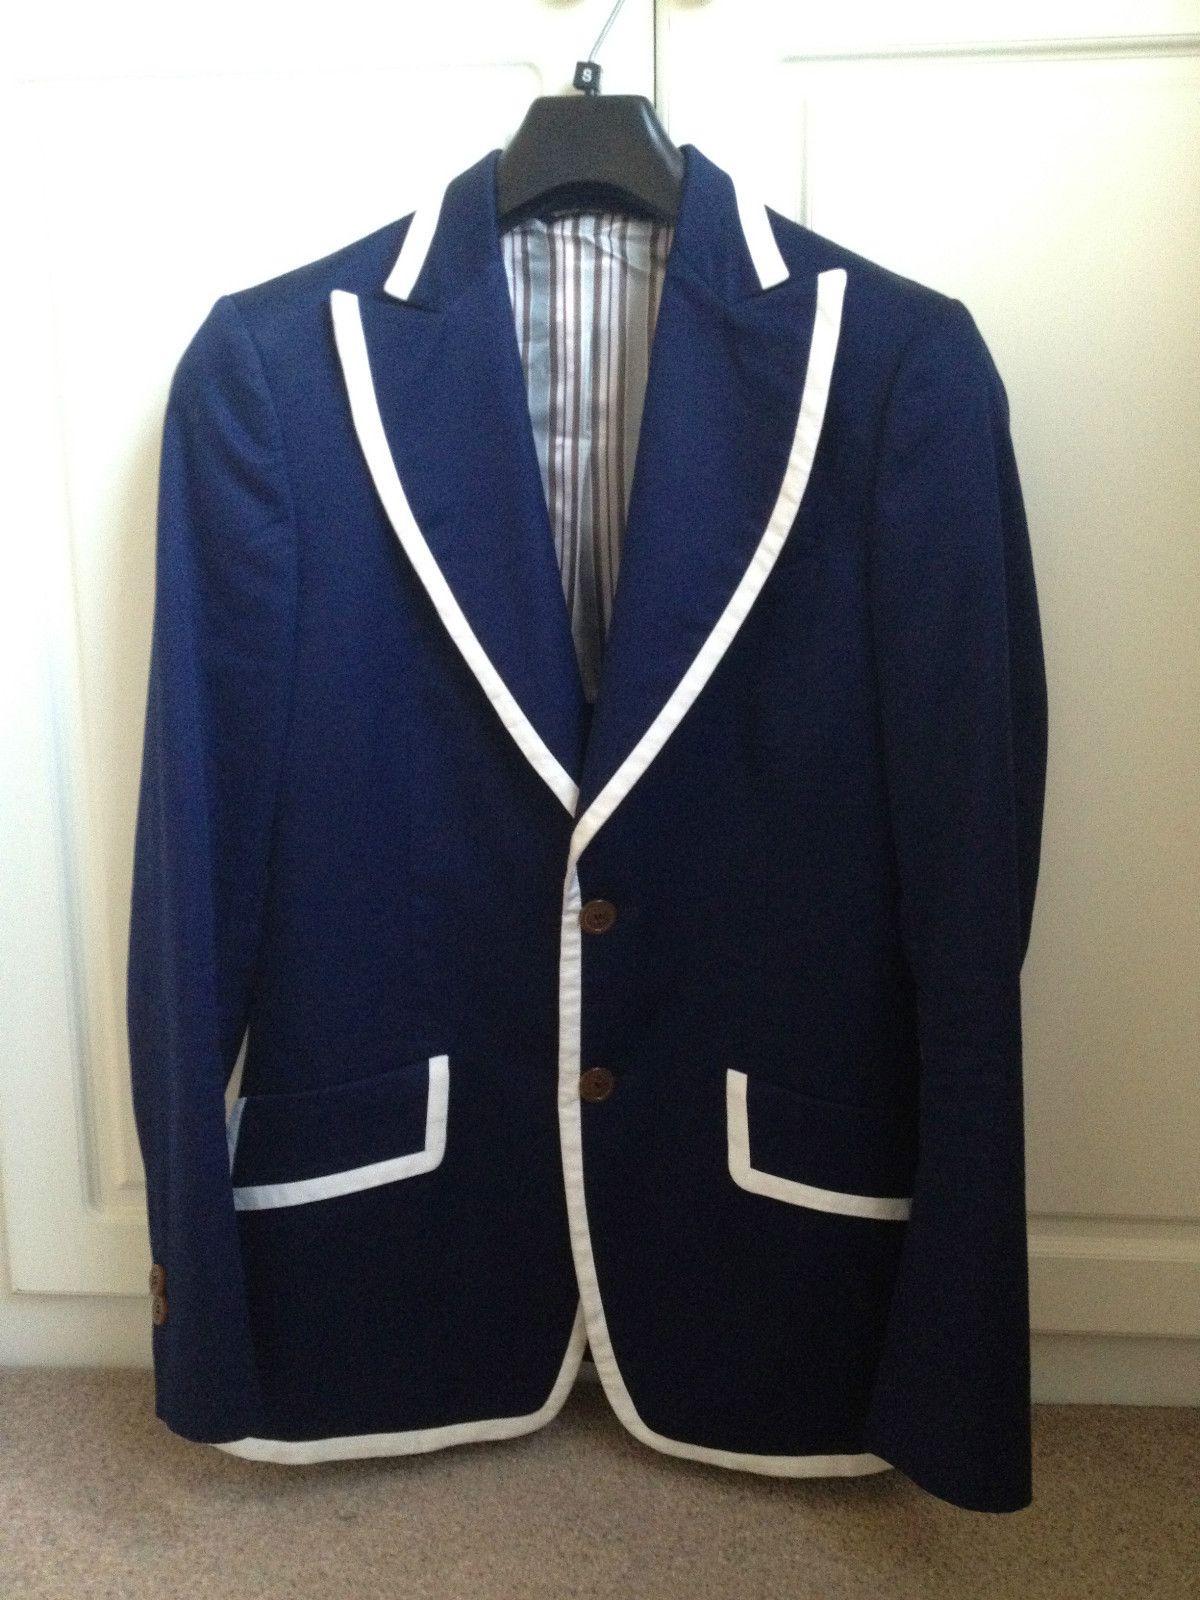 VIVIENNE WESTWOOD MAN ULTRAMARINE BLUE TOMMY NUTTER JACKET SIZE 46 UK 36